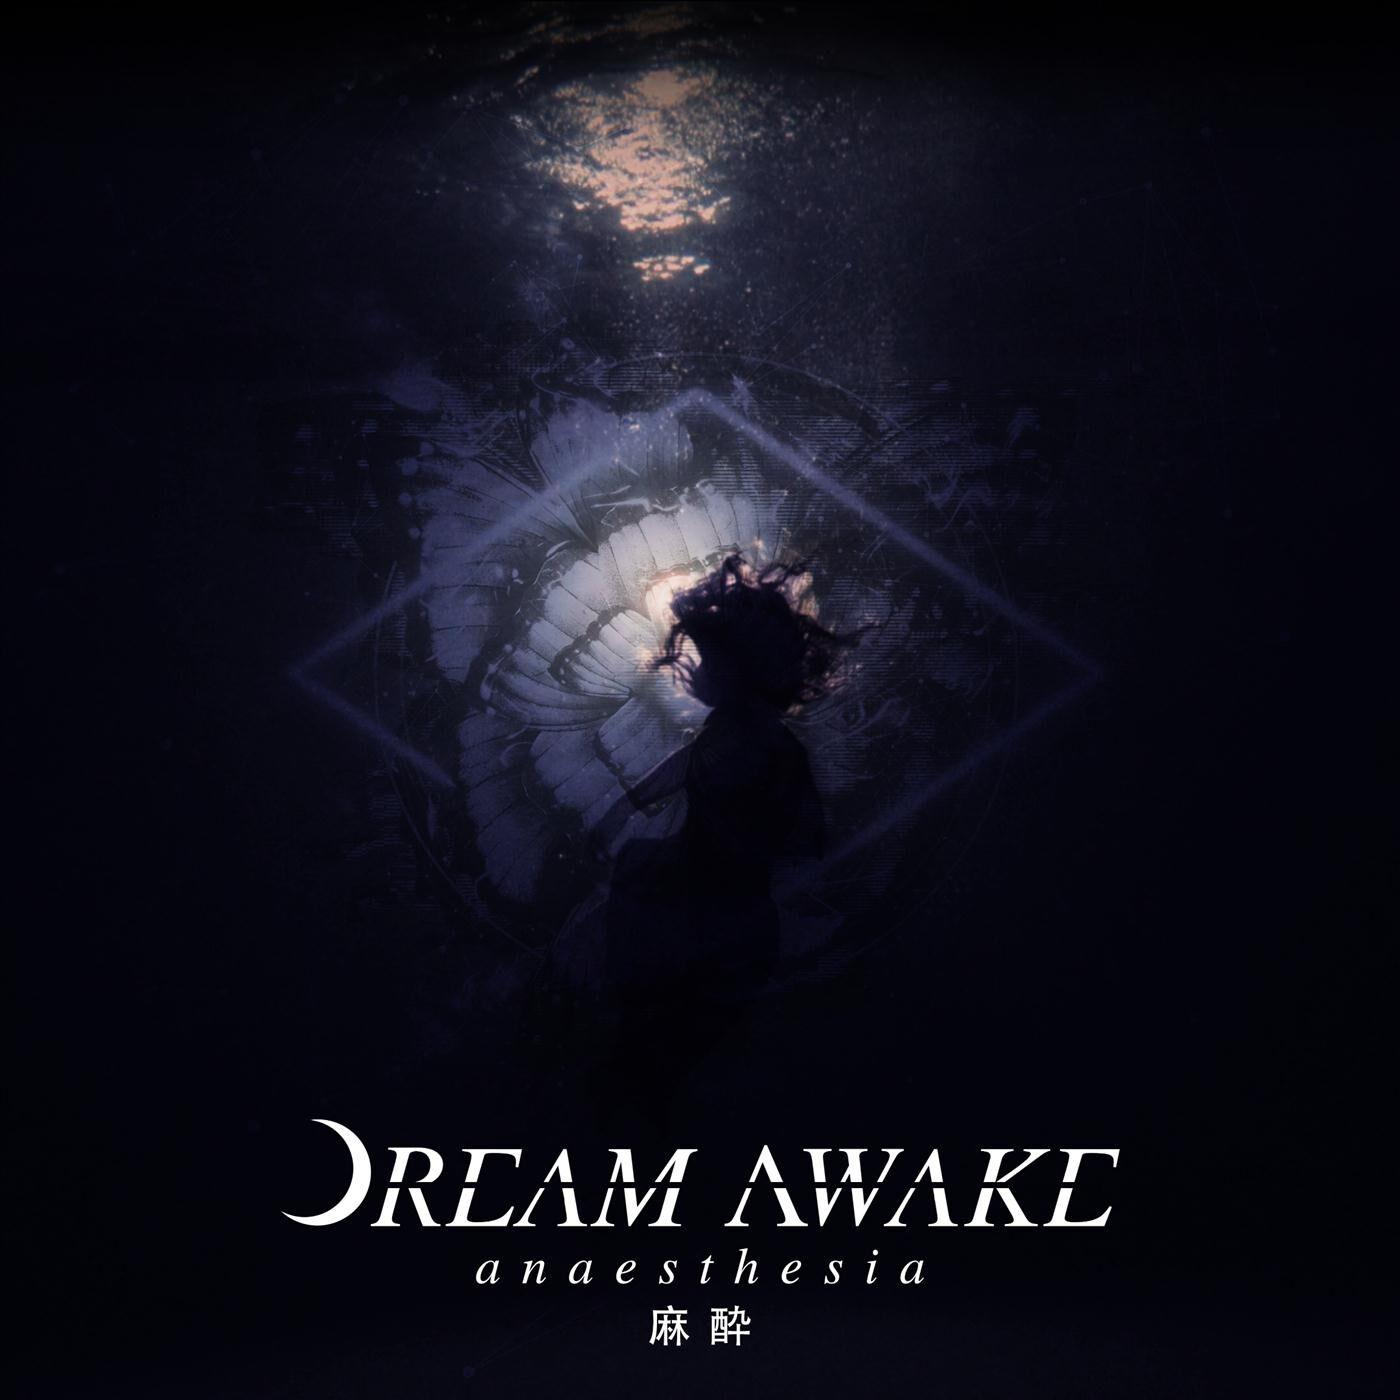 Dream Awake - Anaesthesia [single] (2020)